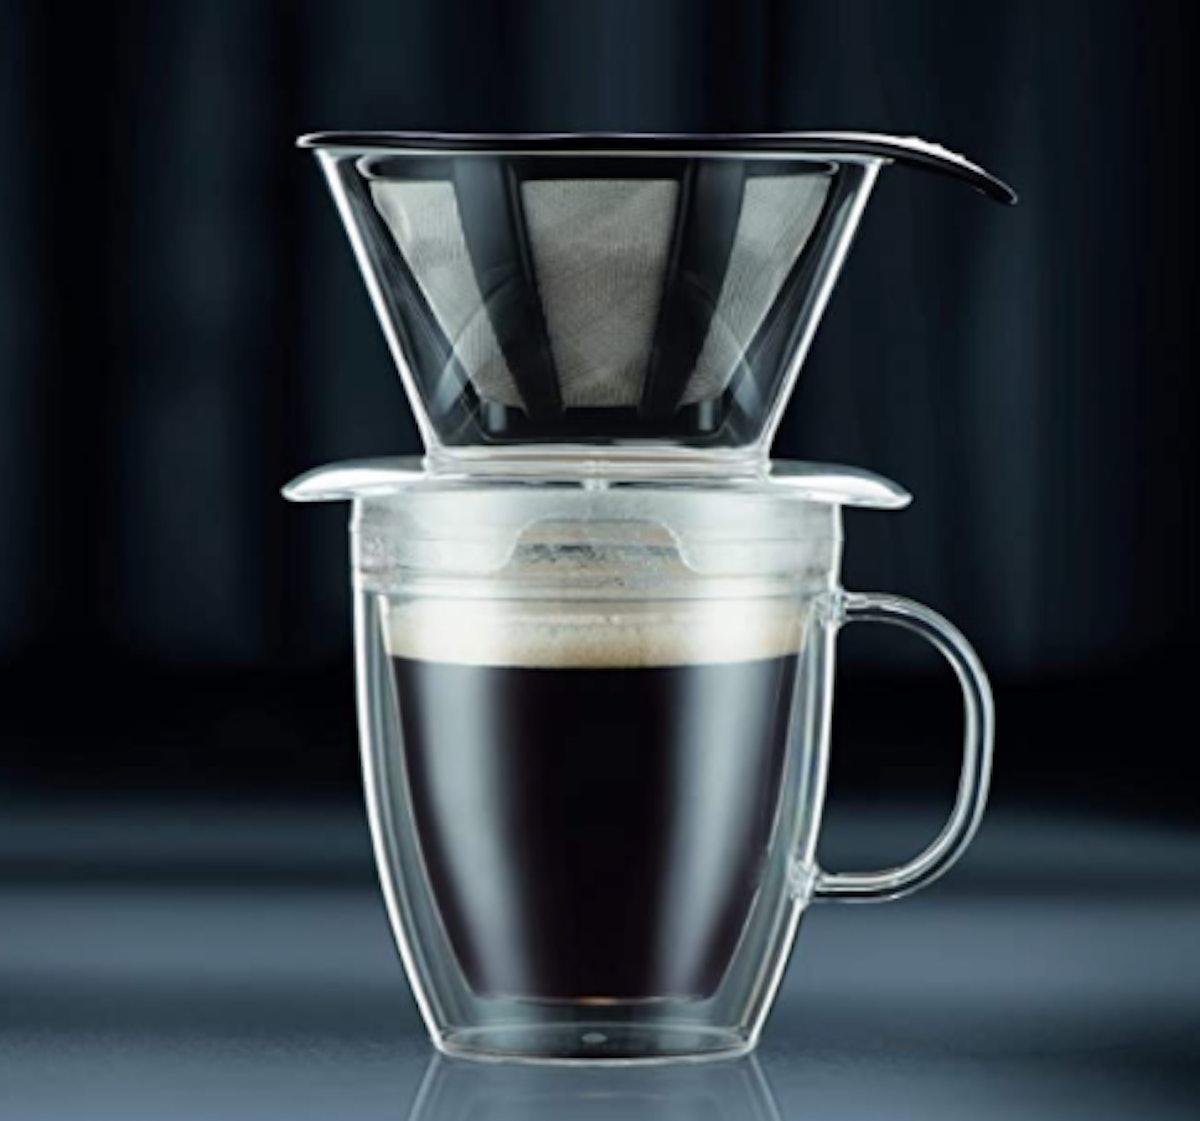 Bodum Pour Over Coffee Dripper